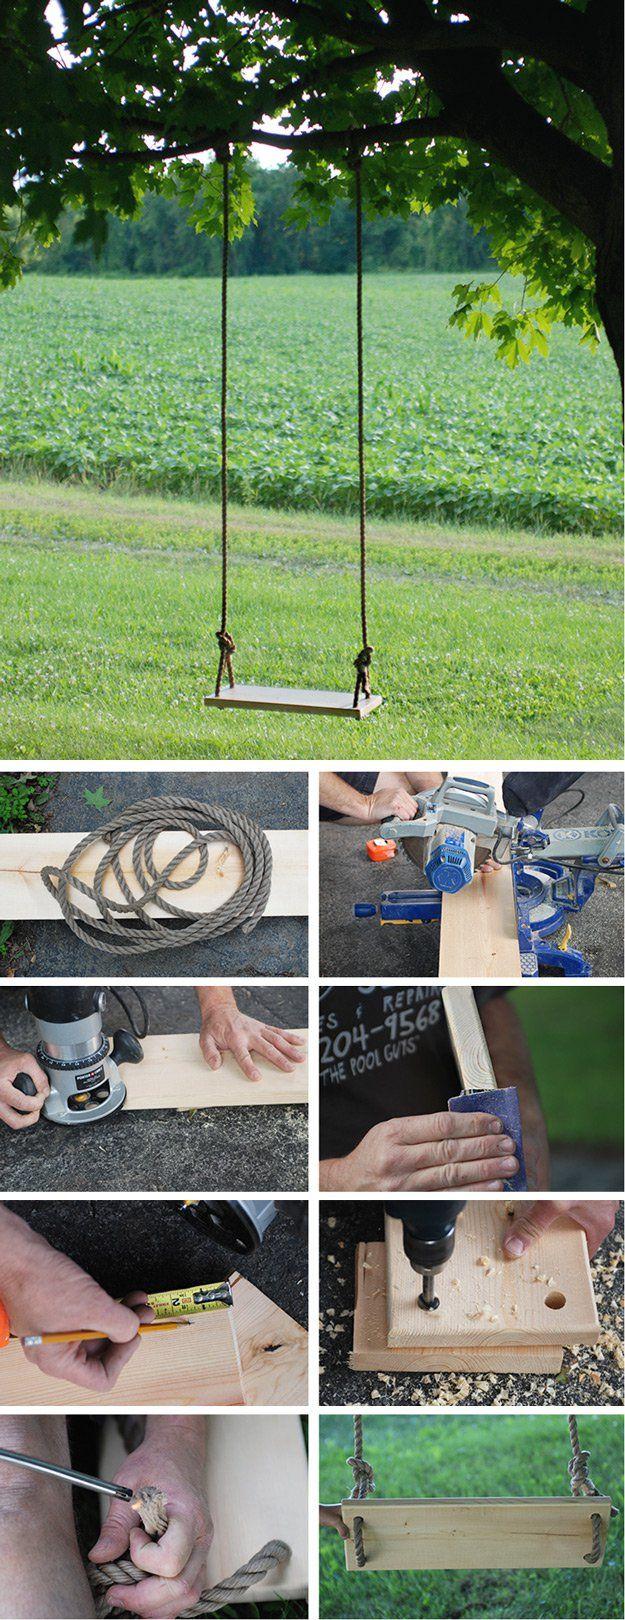 17 Easy Diy Backyard Project Ideas 6